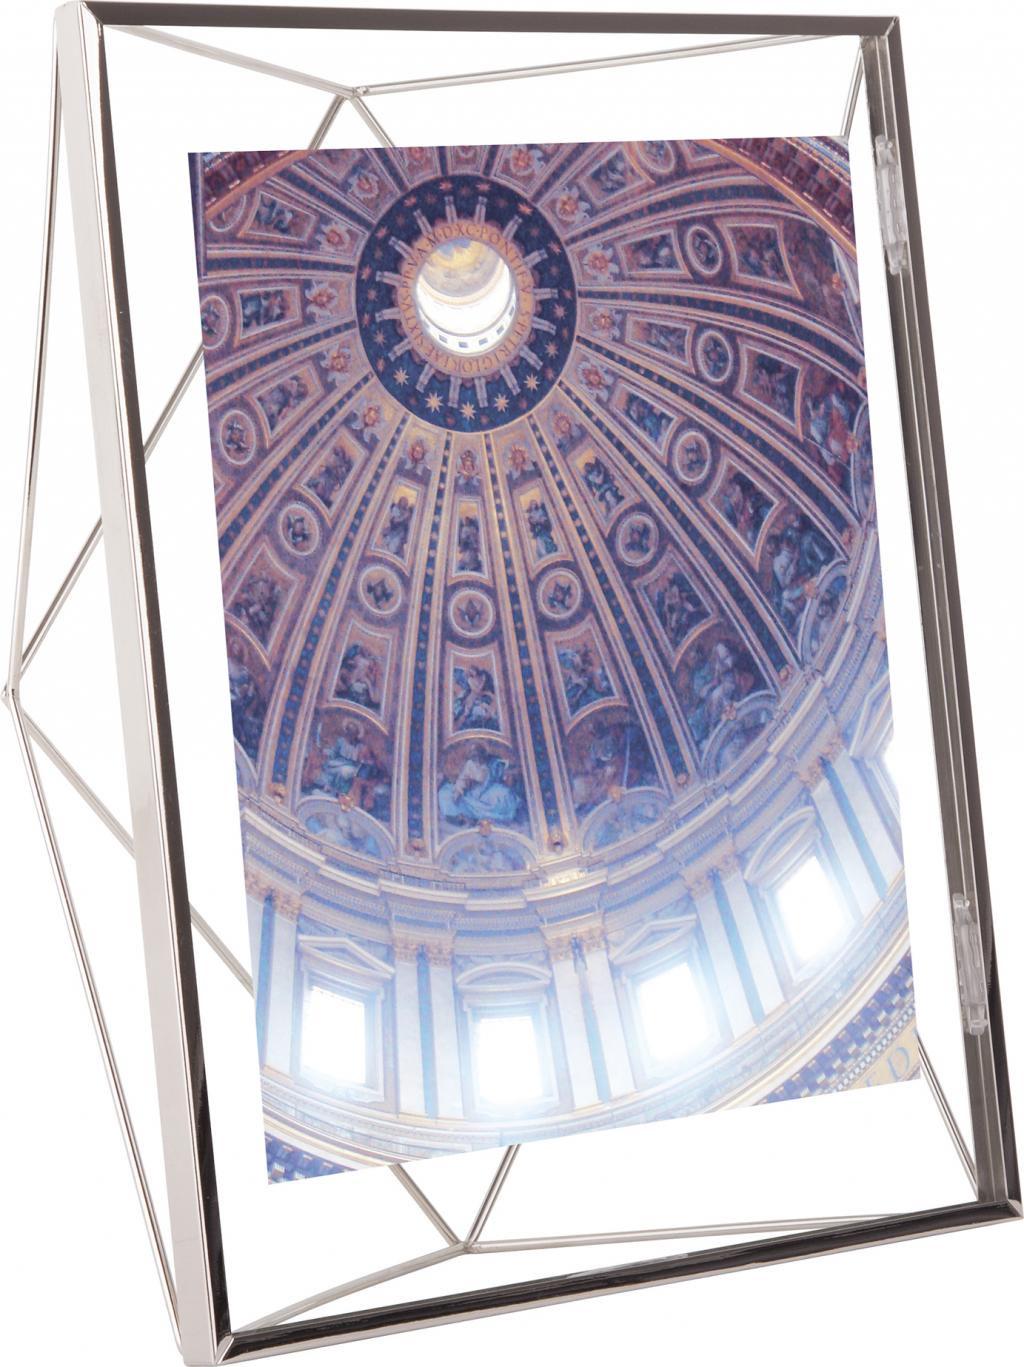 Bilderrahmen Prisma - 31 x 25 cm - Chrom - Umbra kaufen ...